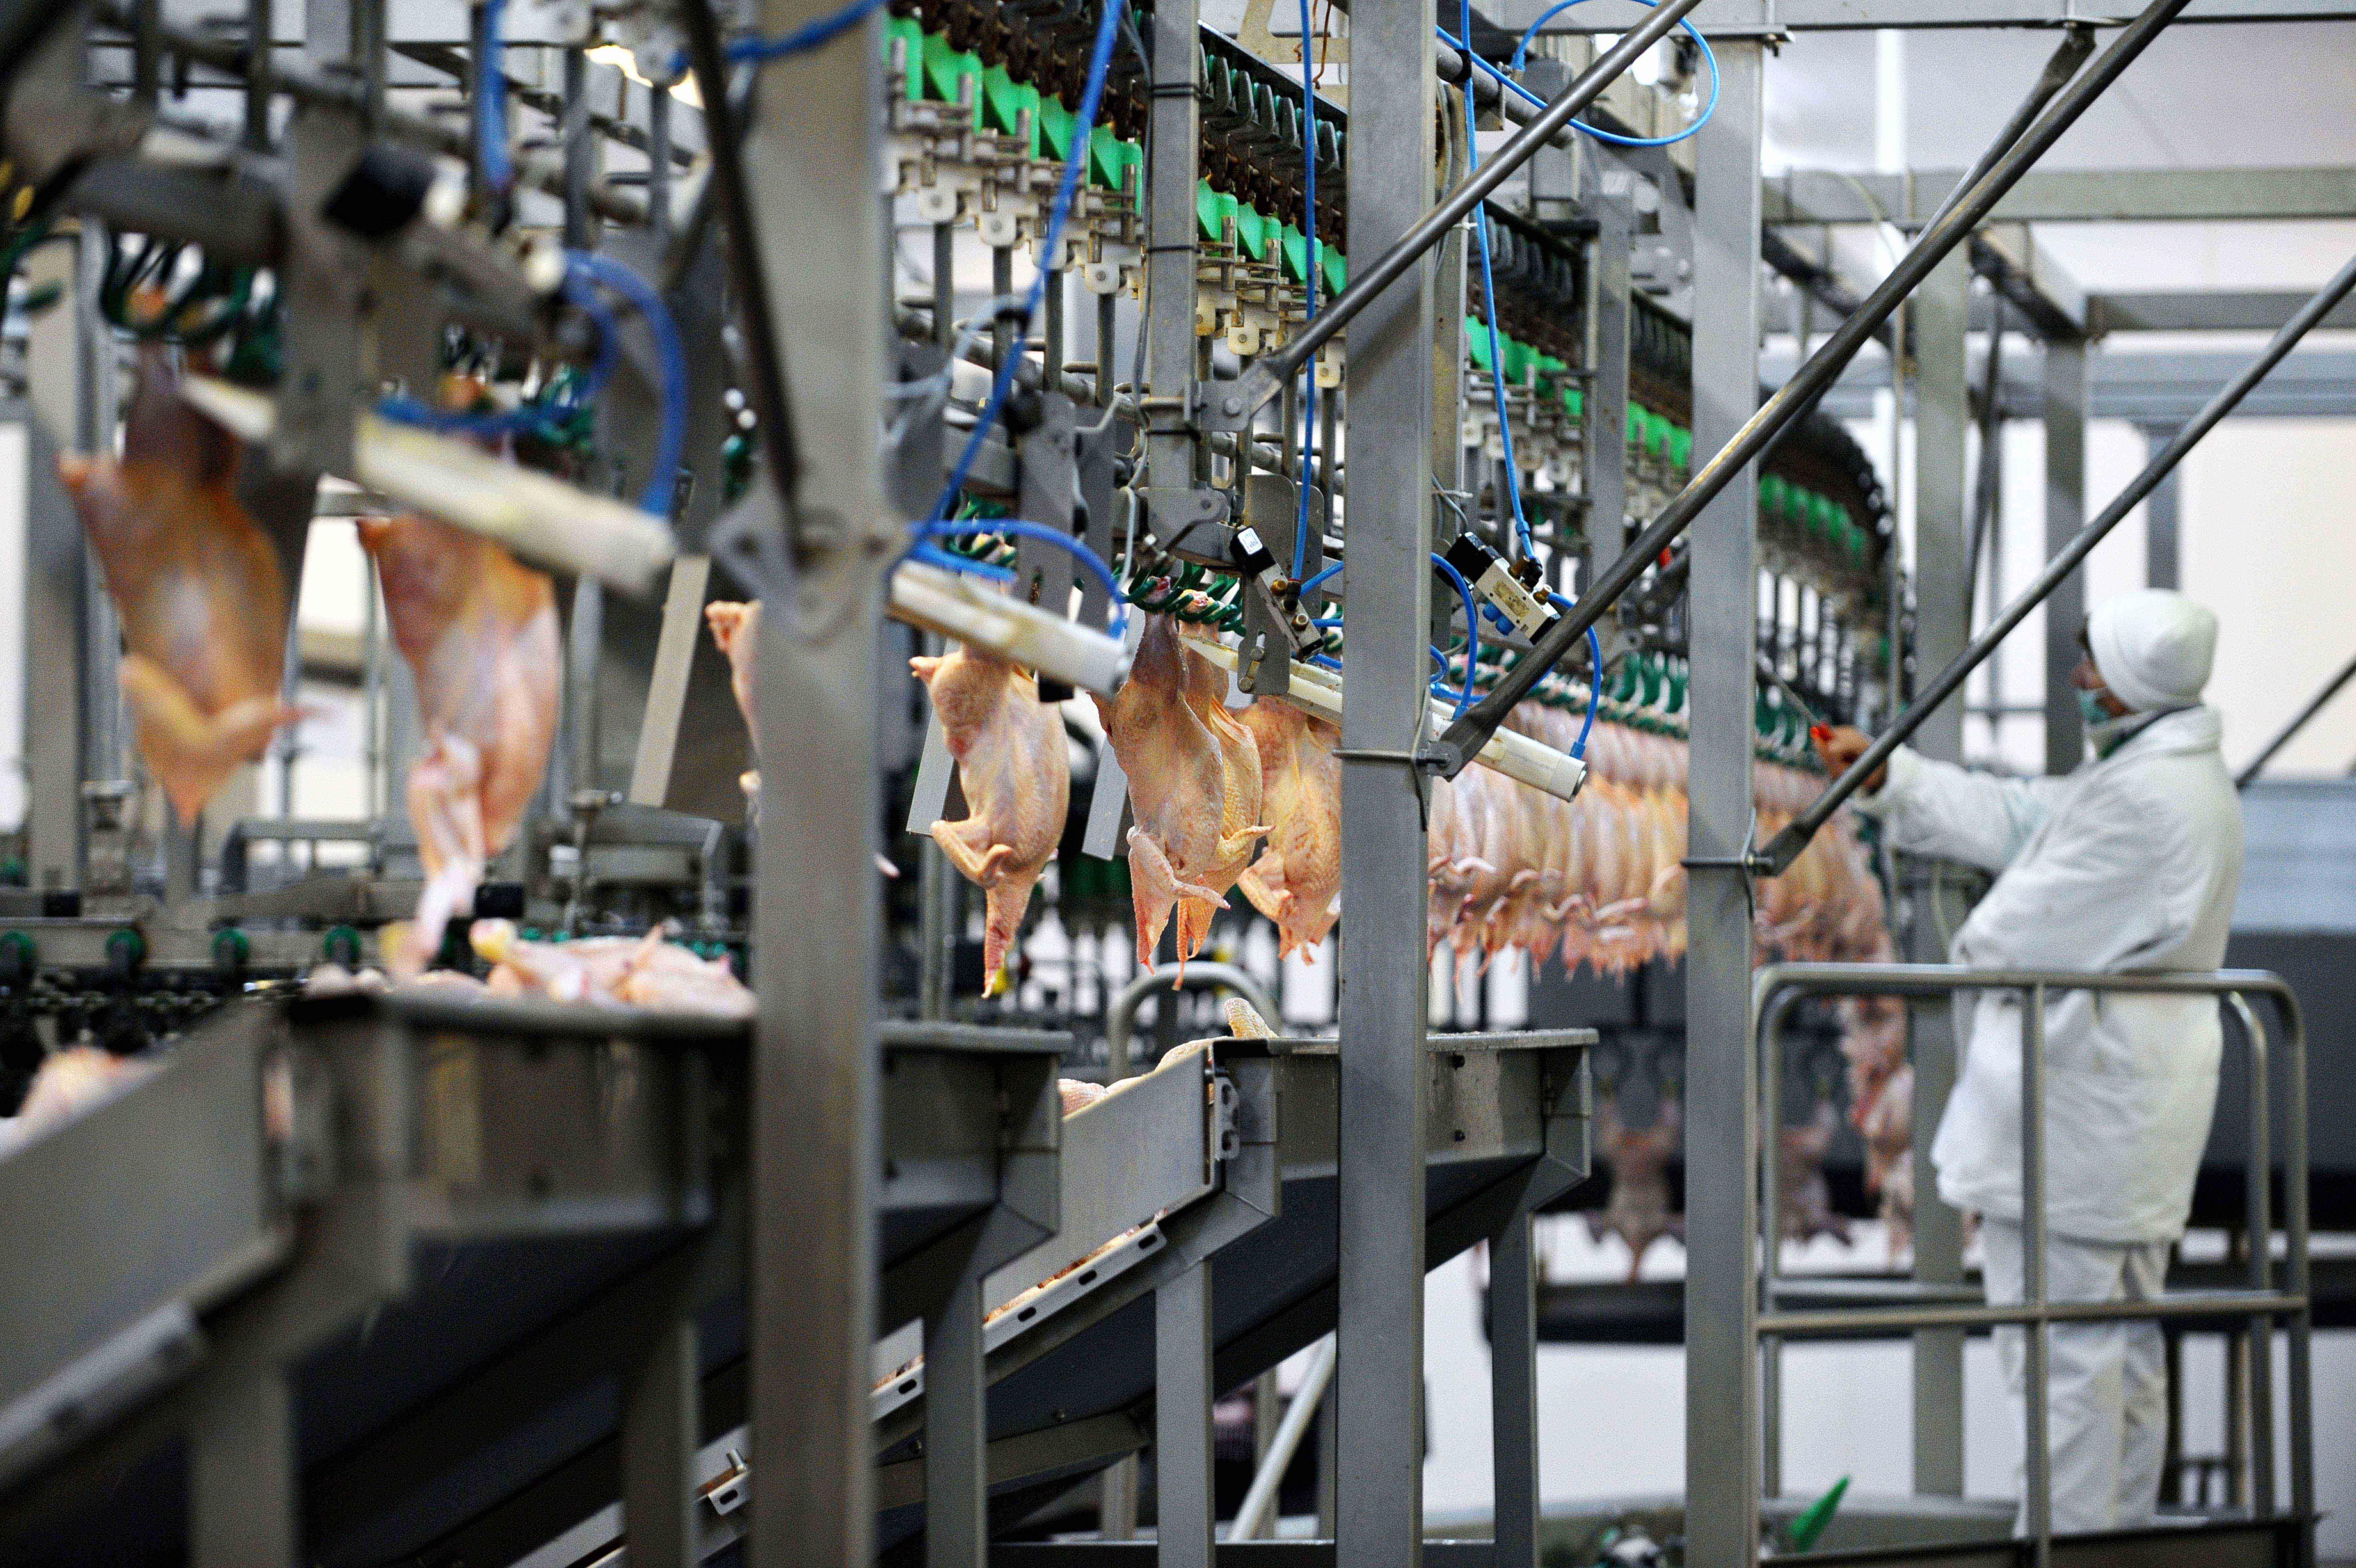 Farm industry equipment supplier